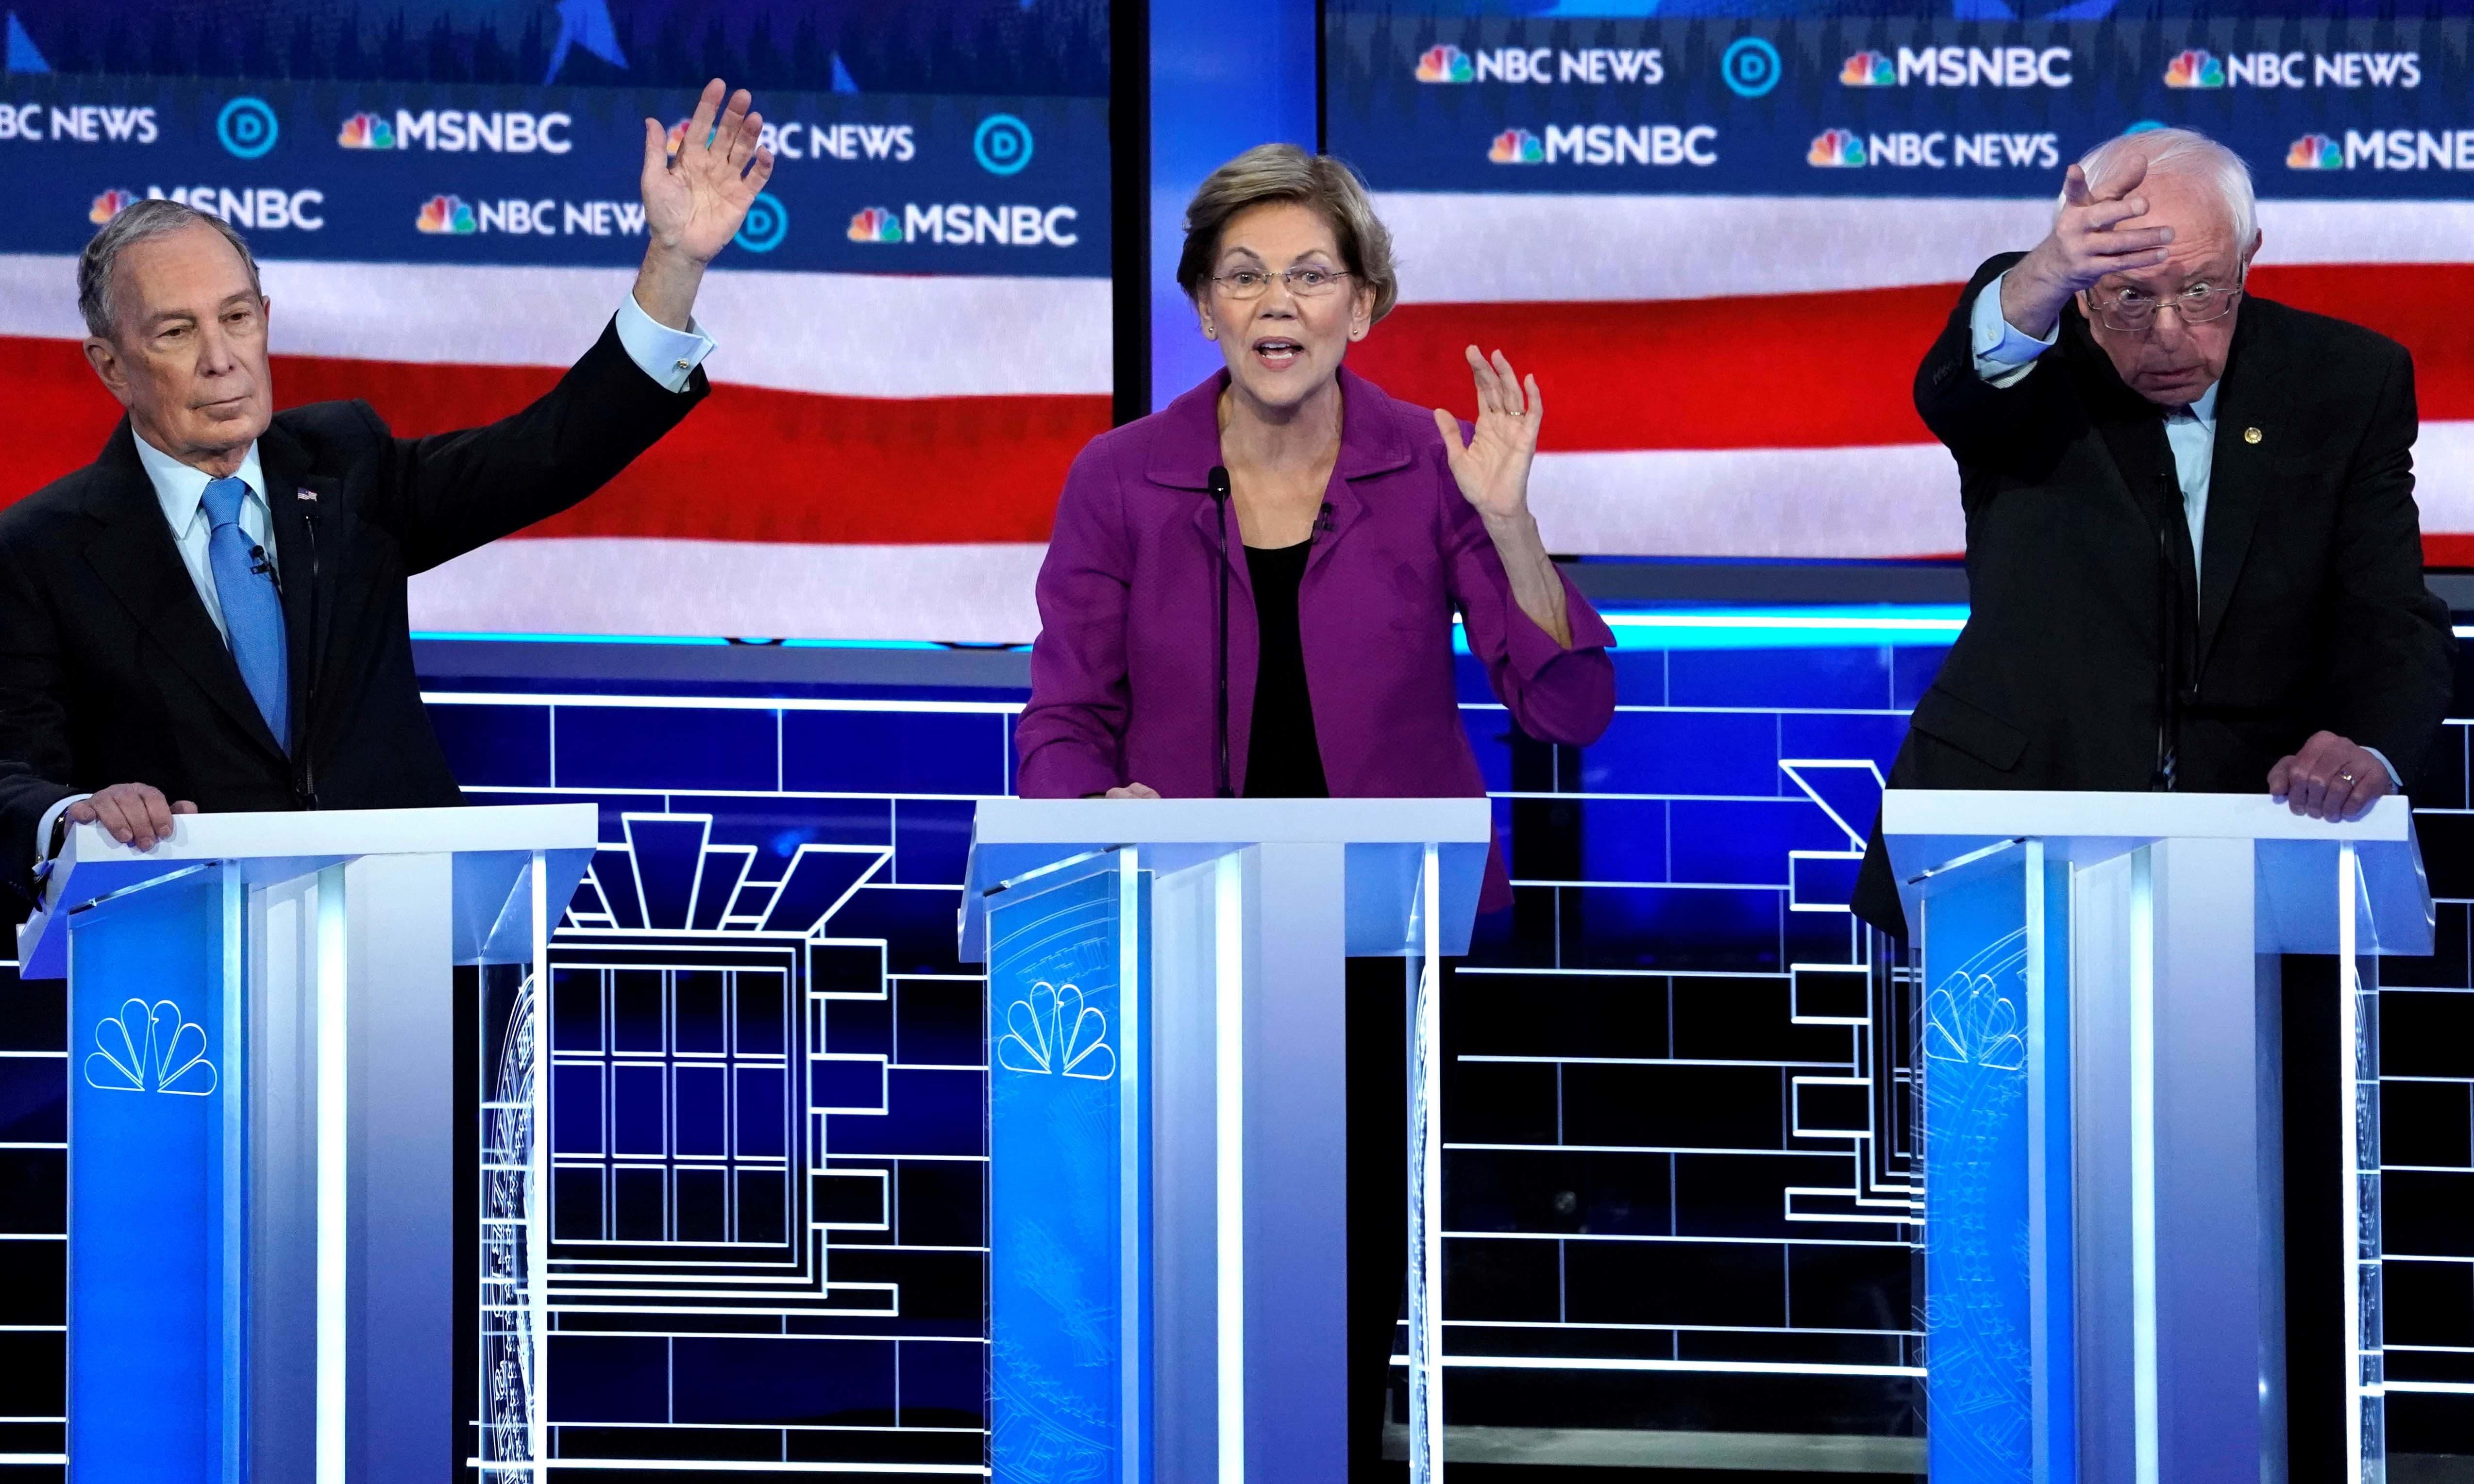 Senator Elizabeth Warren speaks as former New York City mayor Mike Bloomberg and Senator Bernie Sanders try to get the moderators' attention at the Democratic presidential debate on Feb 20. — Reuters